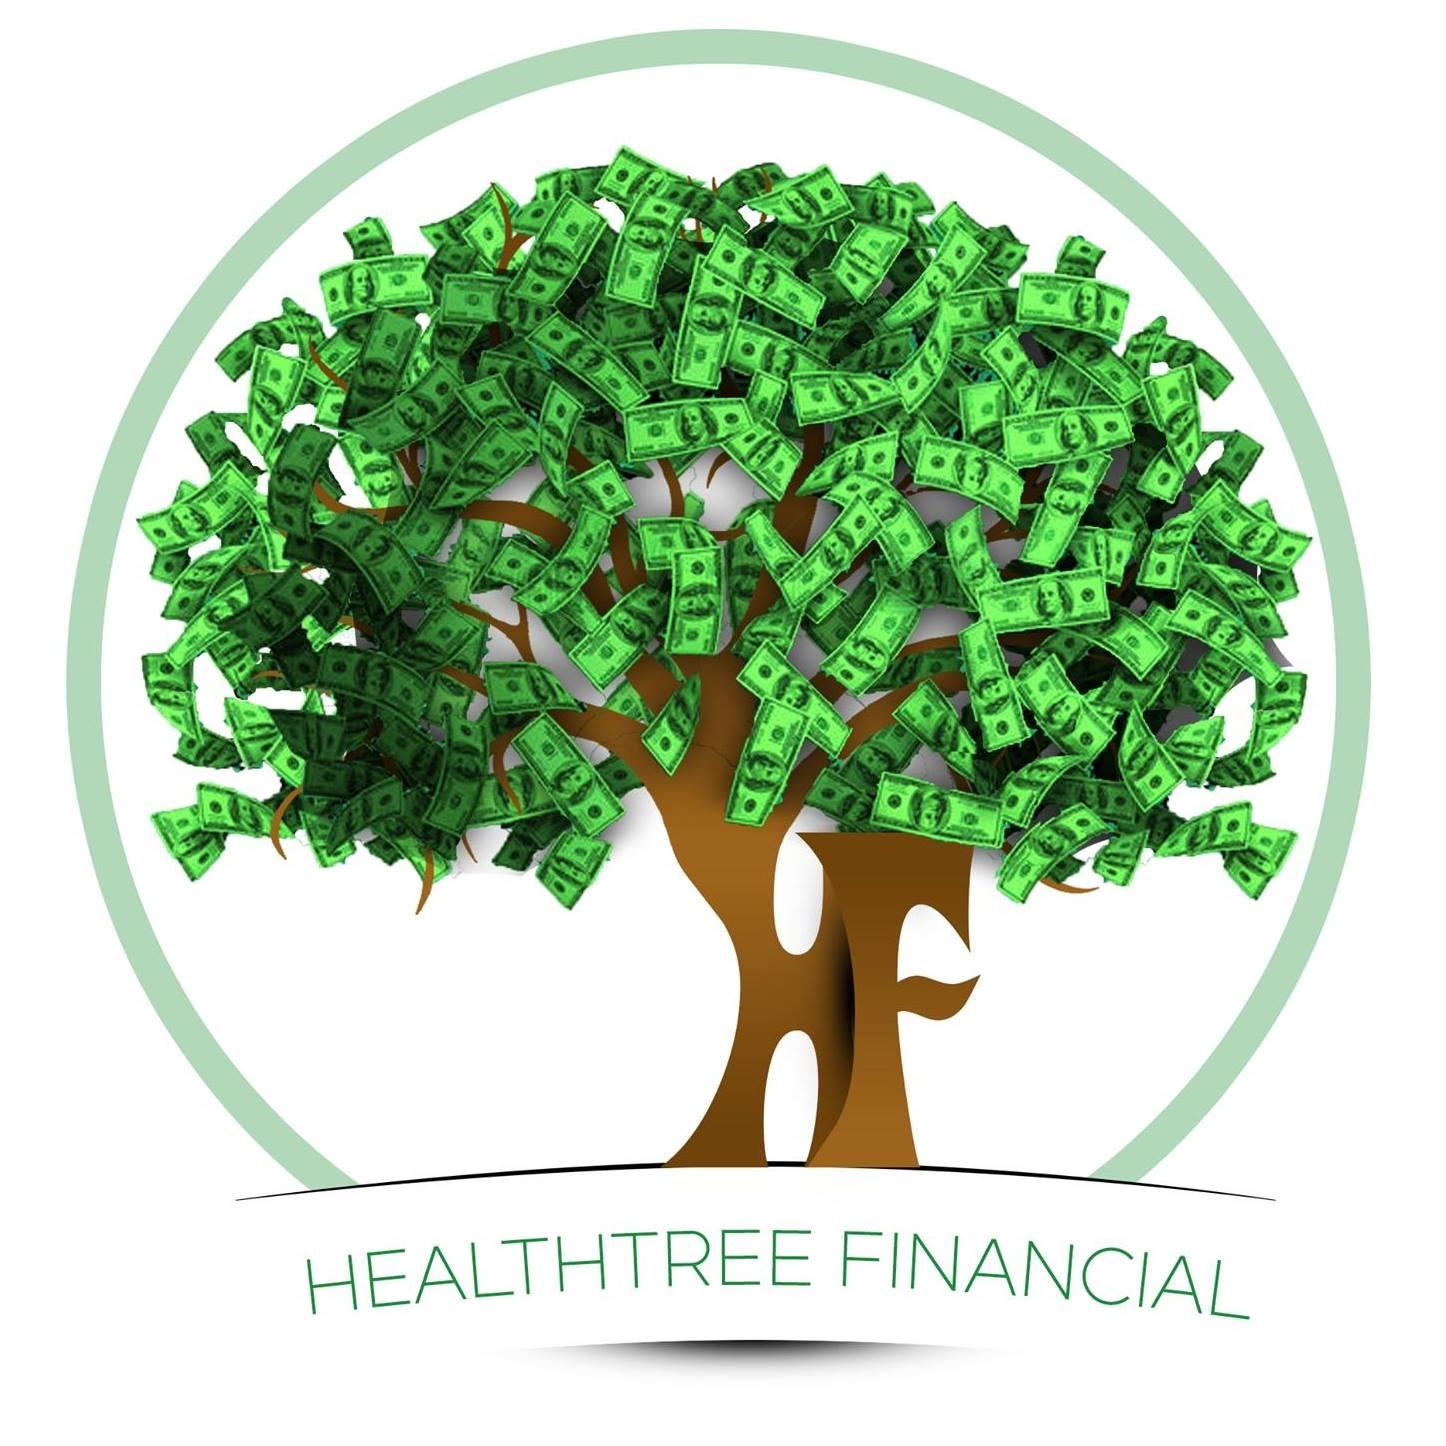 Healthtree Financial Fitness - Bridgeport, CT 06607 - (888)559-2339 | ShowMeLocal.com